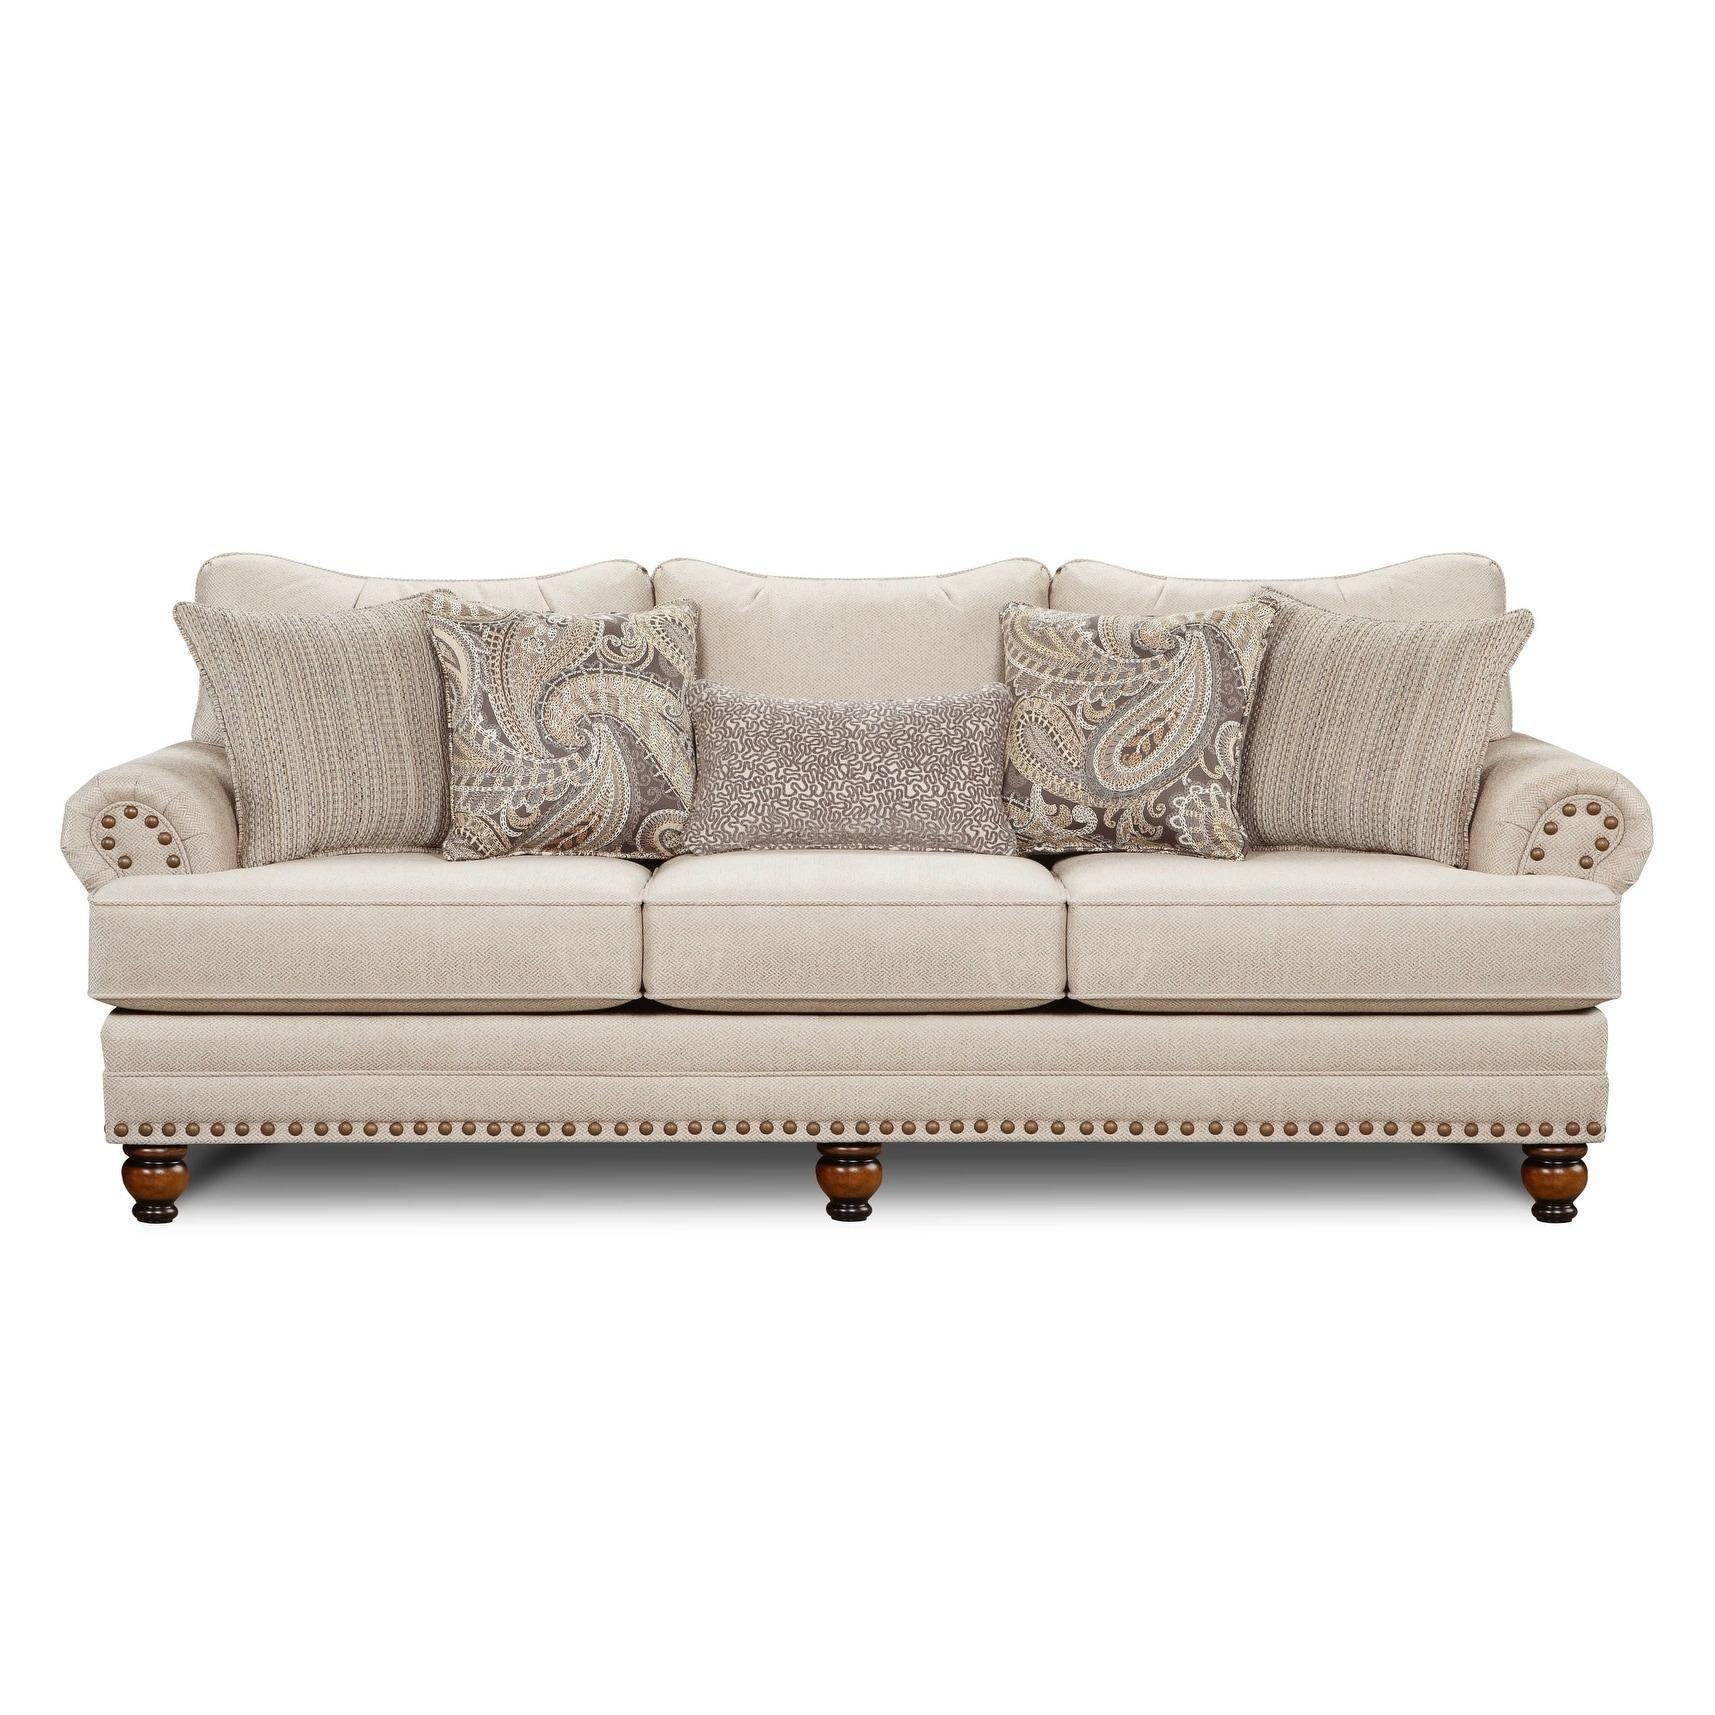 shop carys doe off white sofa free shipping today overstock rh overstock com off white sofa cover off white sofa decorating